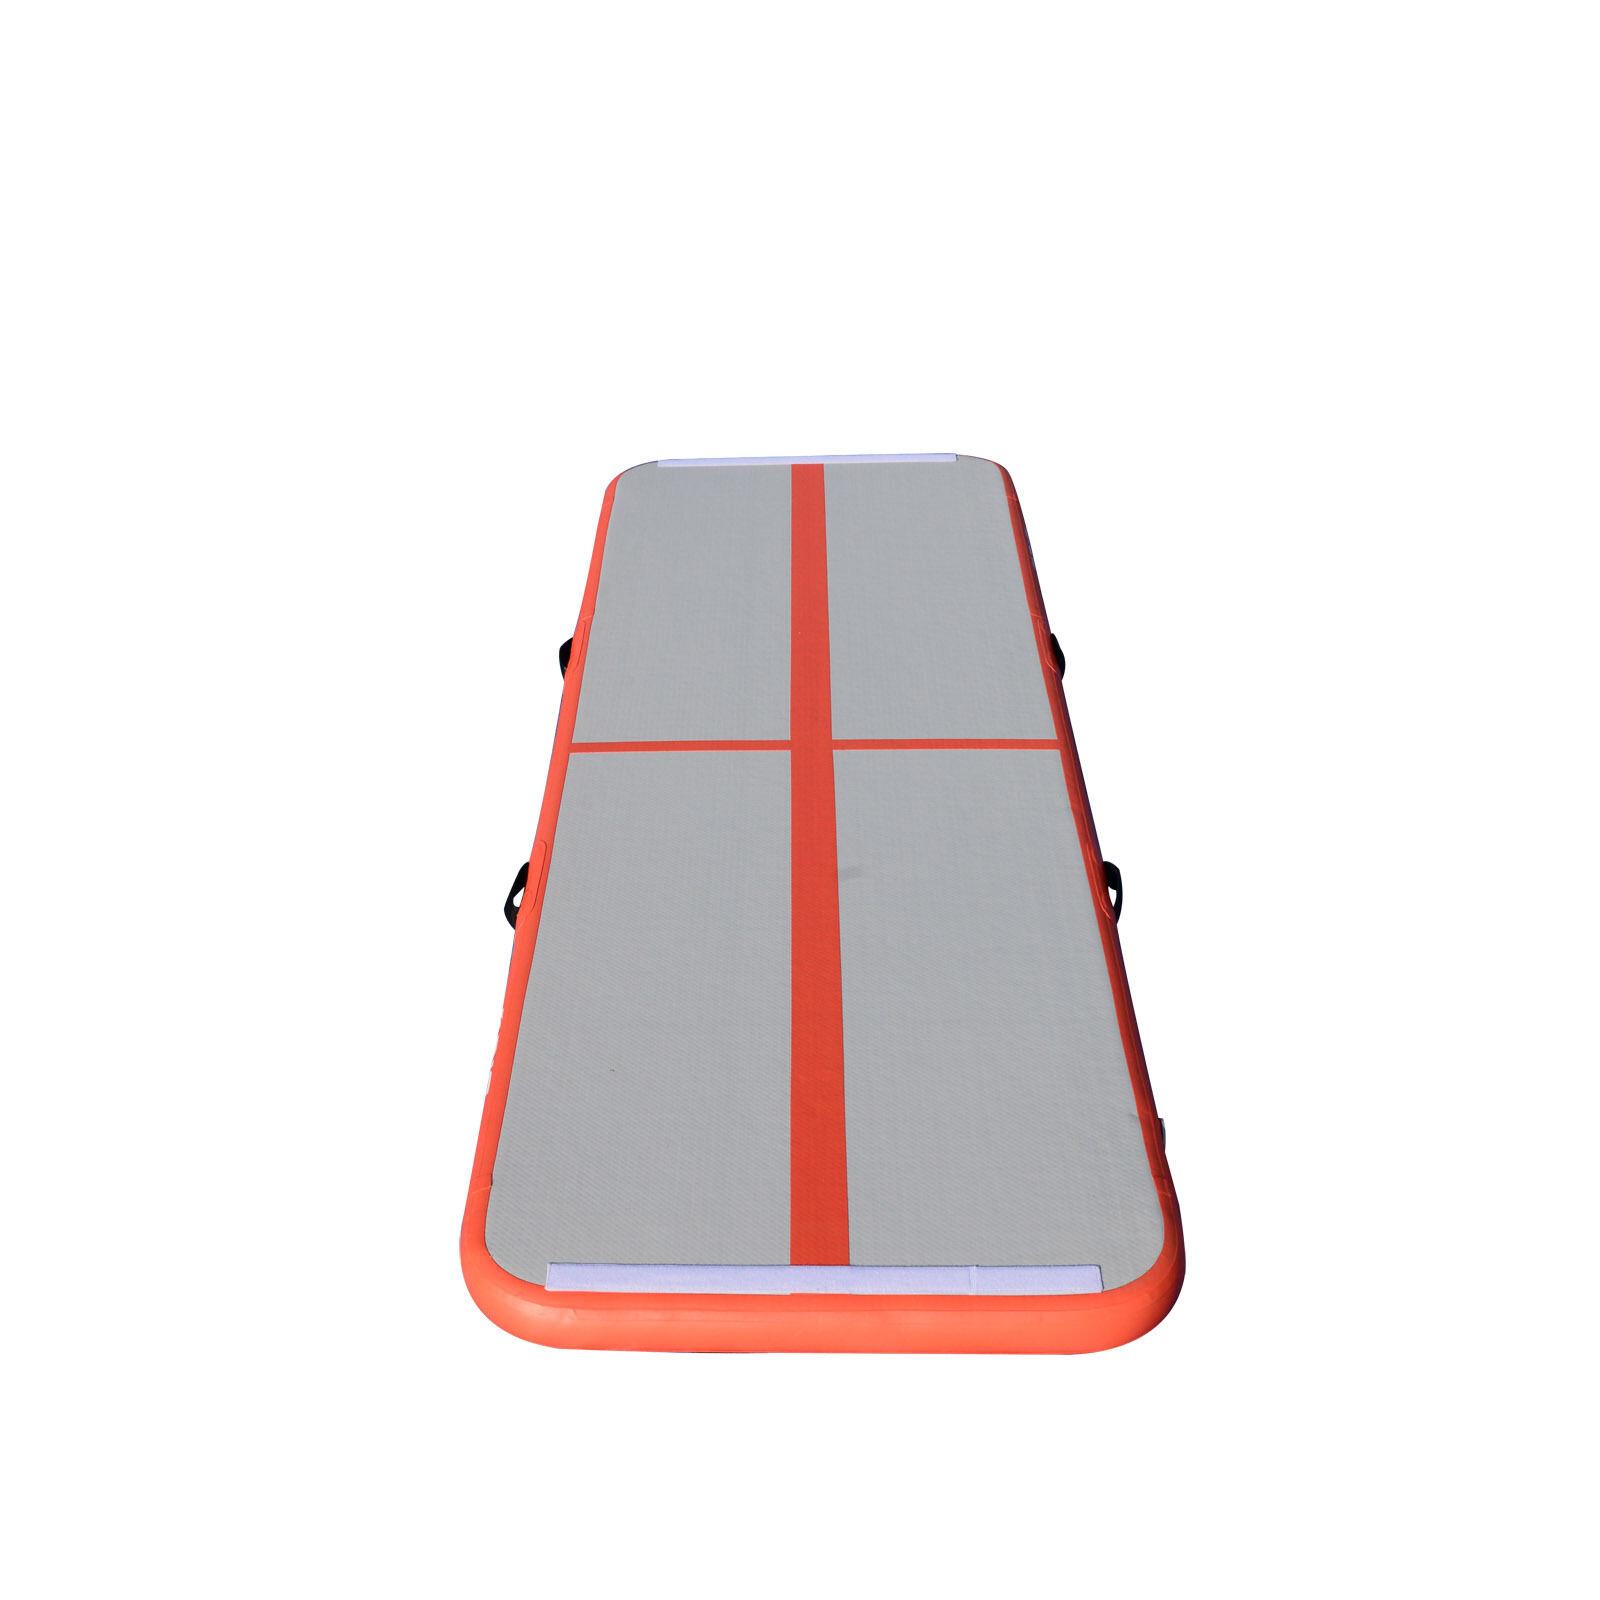 gymnastic mats air track floor home gymnastics tumbling mat inflatable air tumbling track gym